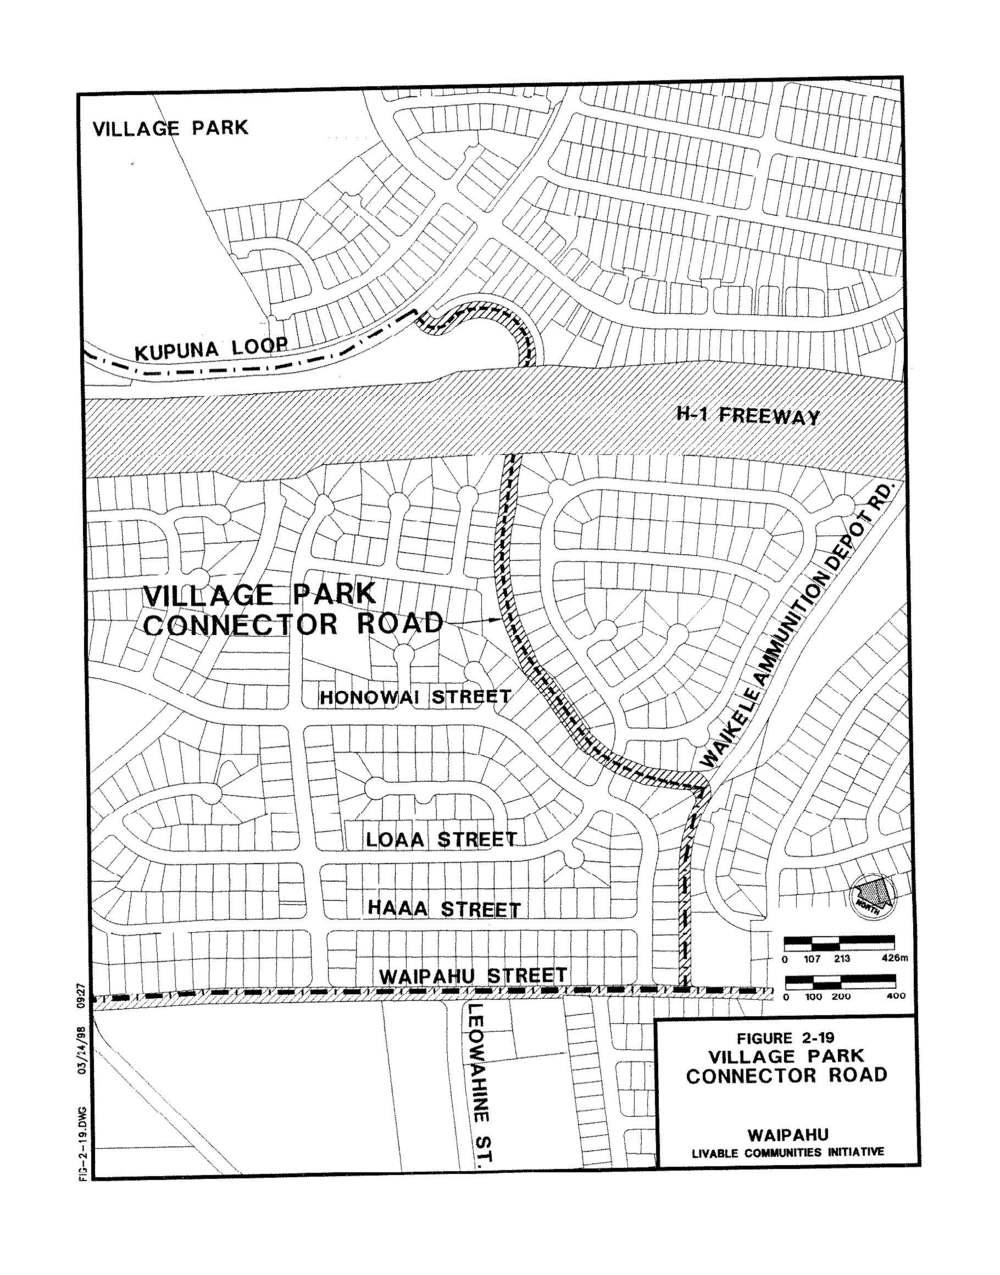 160531_WaipahuLivableCommunities(1998)_Page_072.jpg